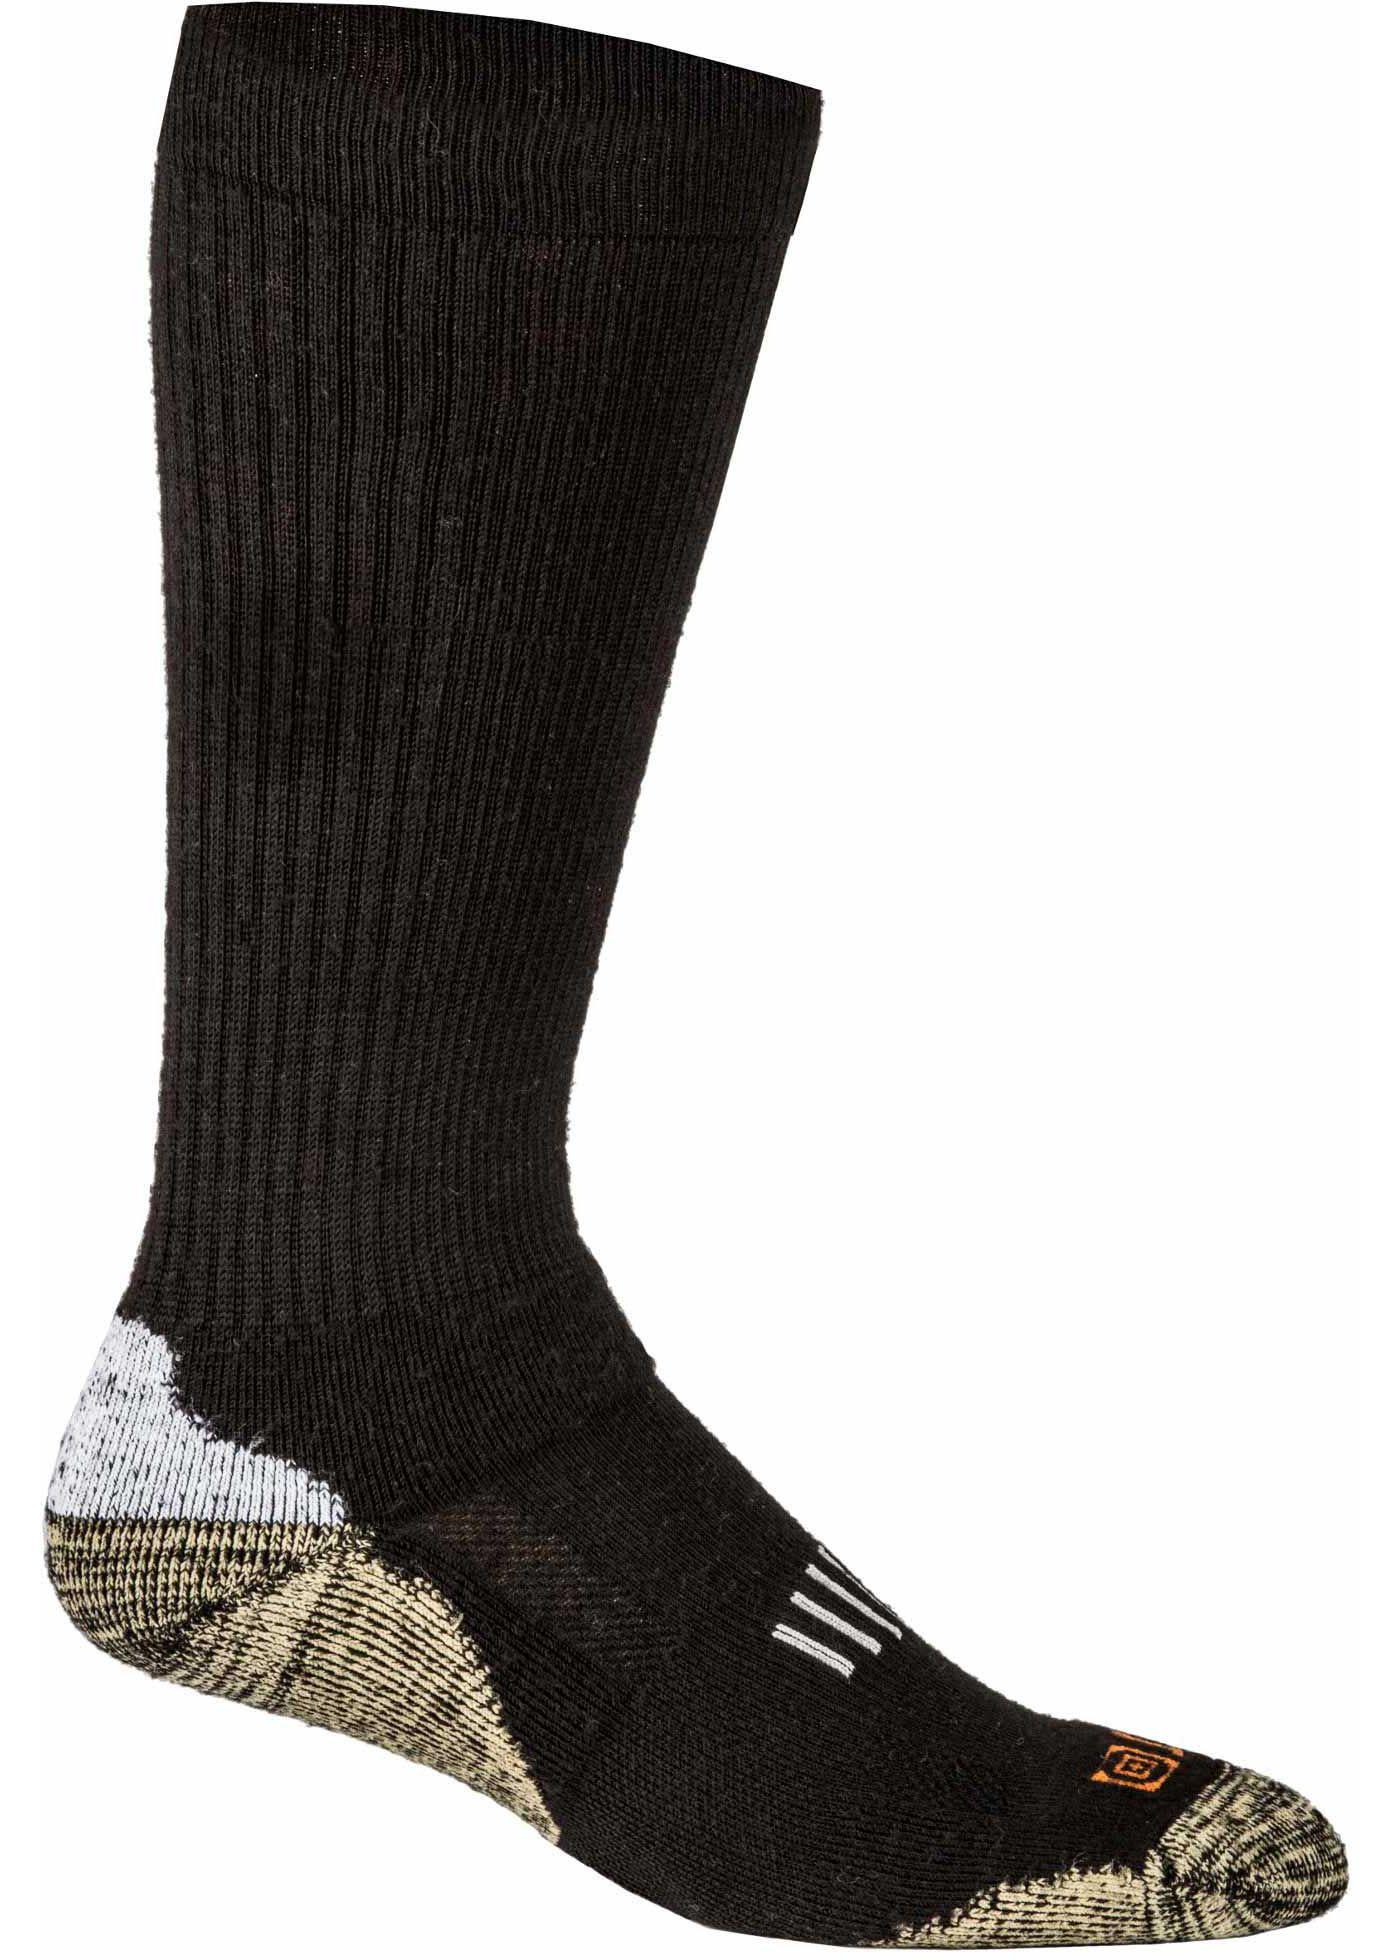 5.11 Tactical Merino Over-the-Calf Boot Socks